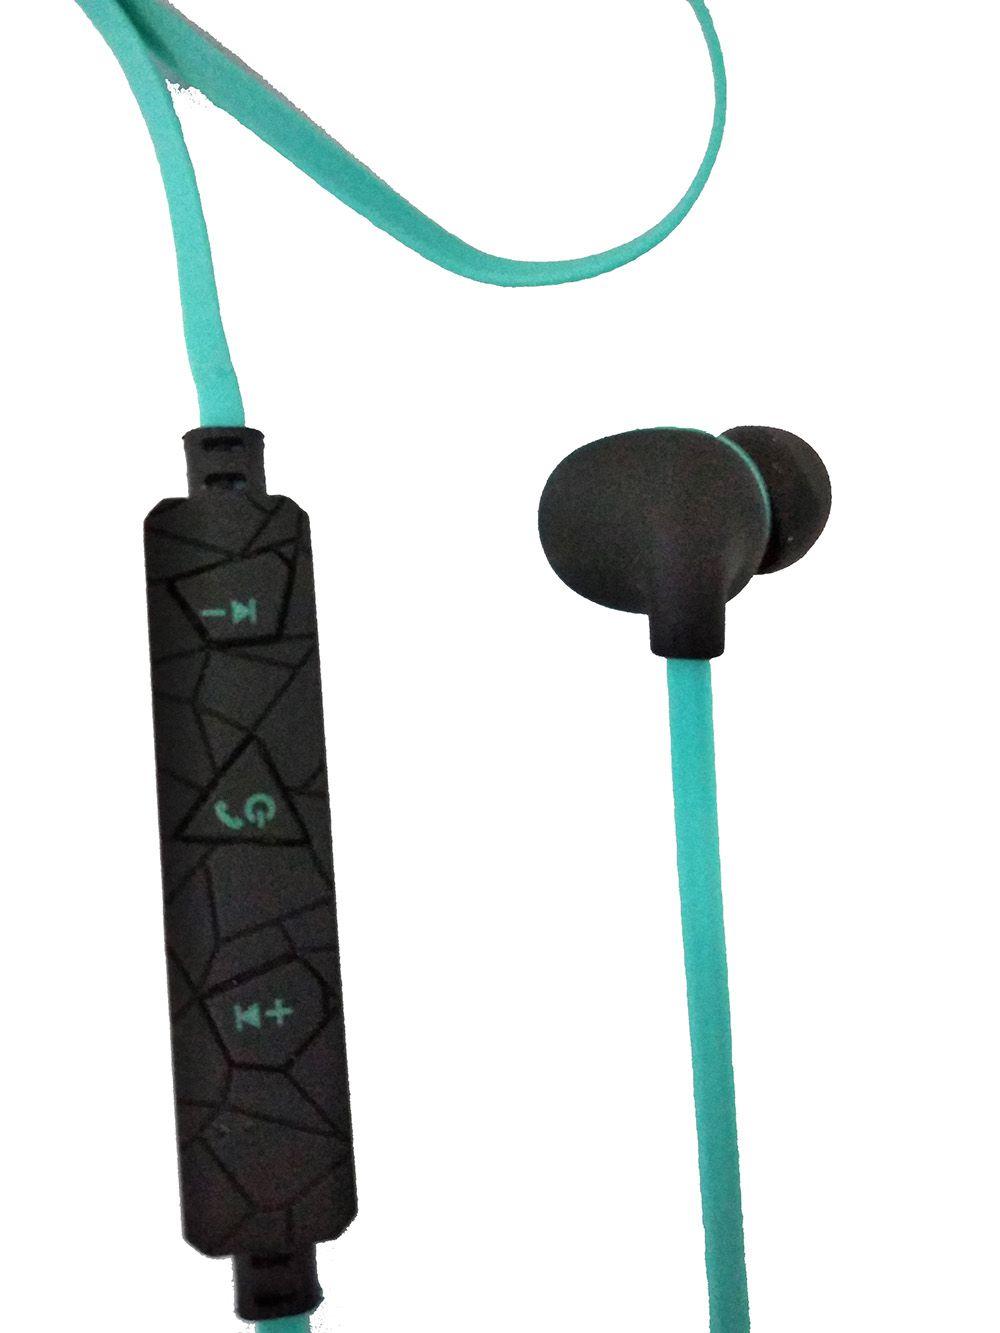 Fone Sem Fio Bluetooth 4.2 Para Corridas - OL500